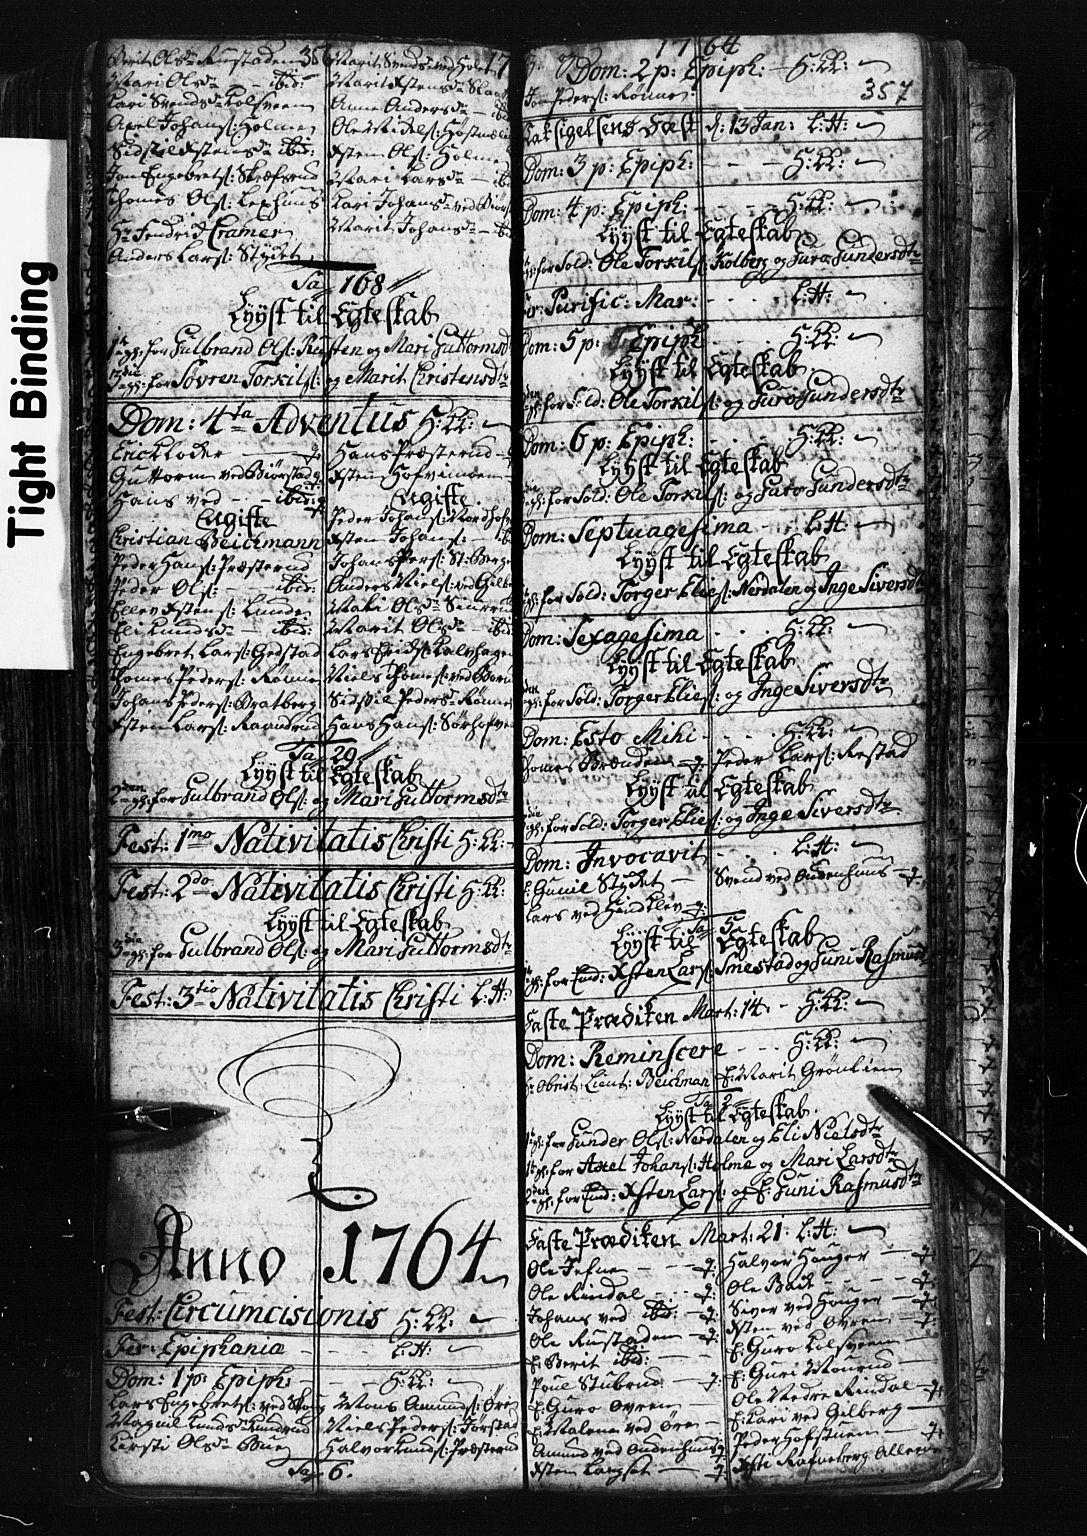 SAH, Fåberg prestekontor, Klokkerbok nr. 1, 1727-1767, s. 356-357